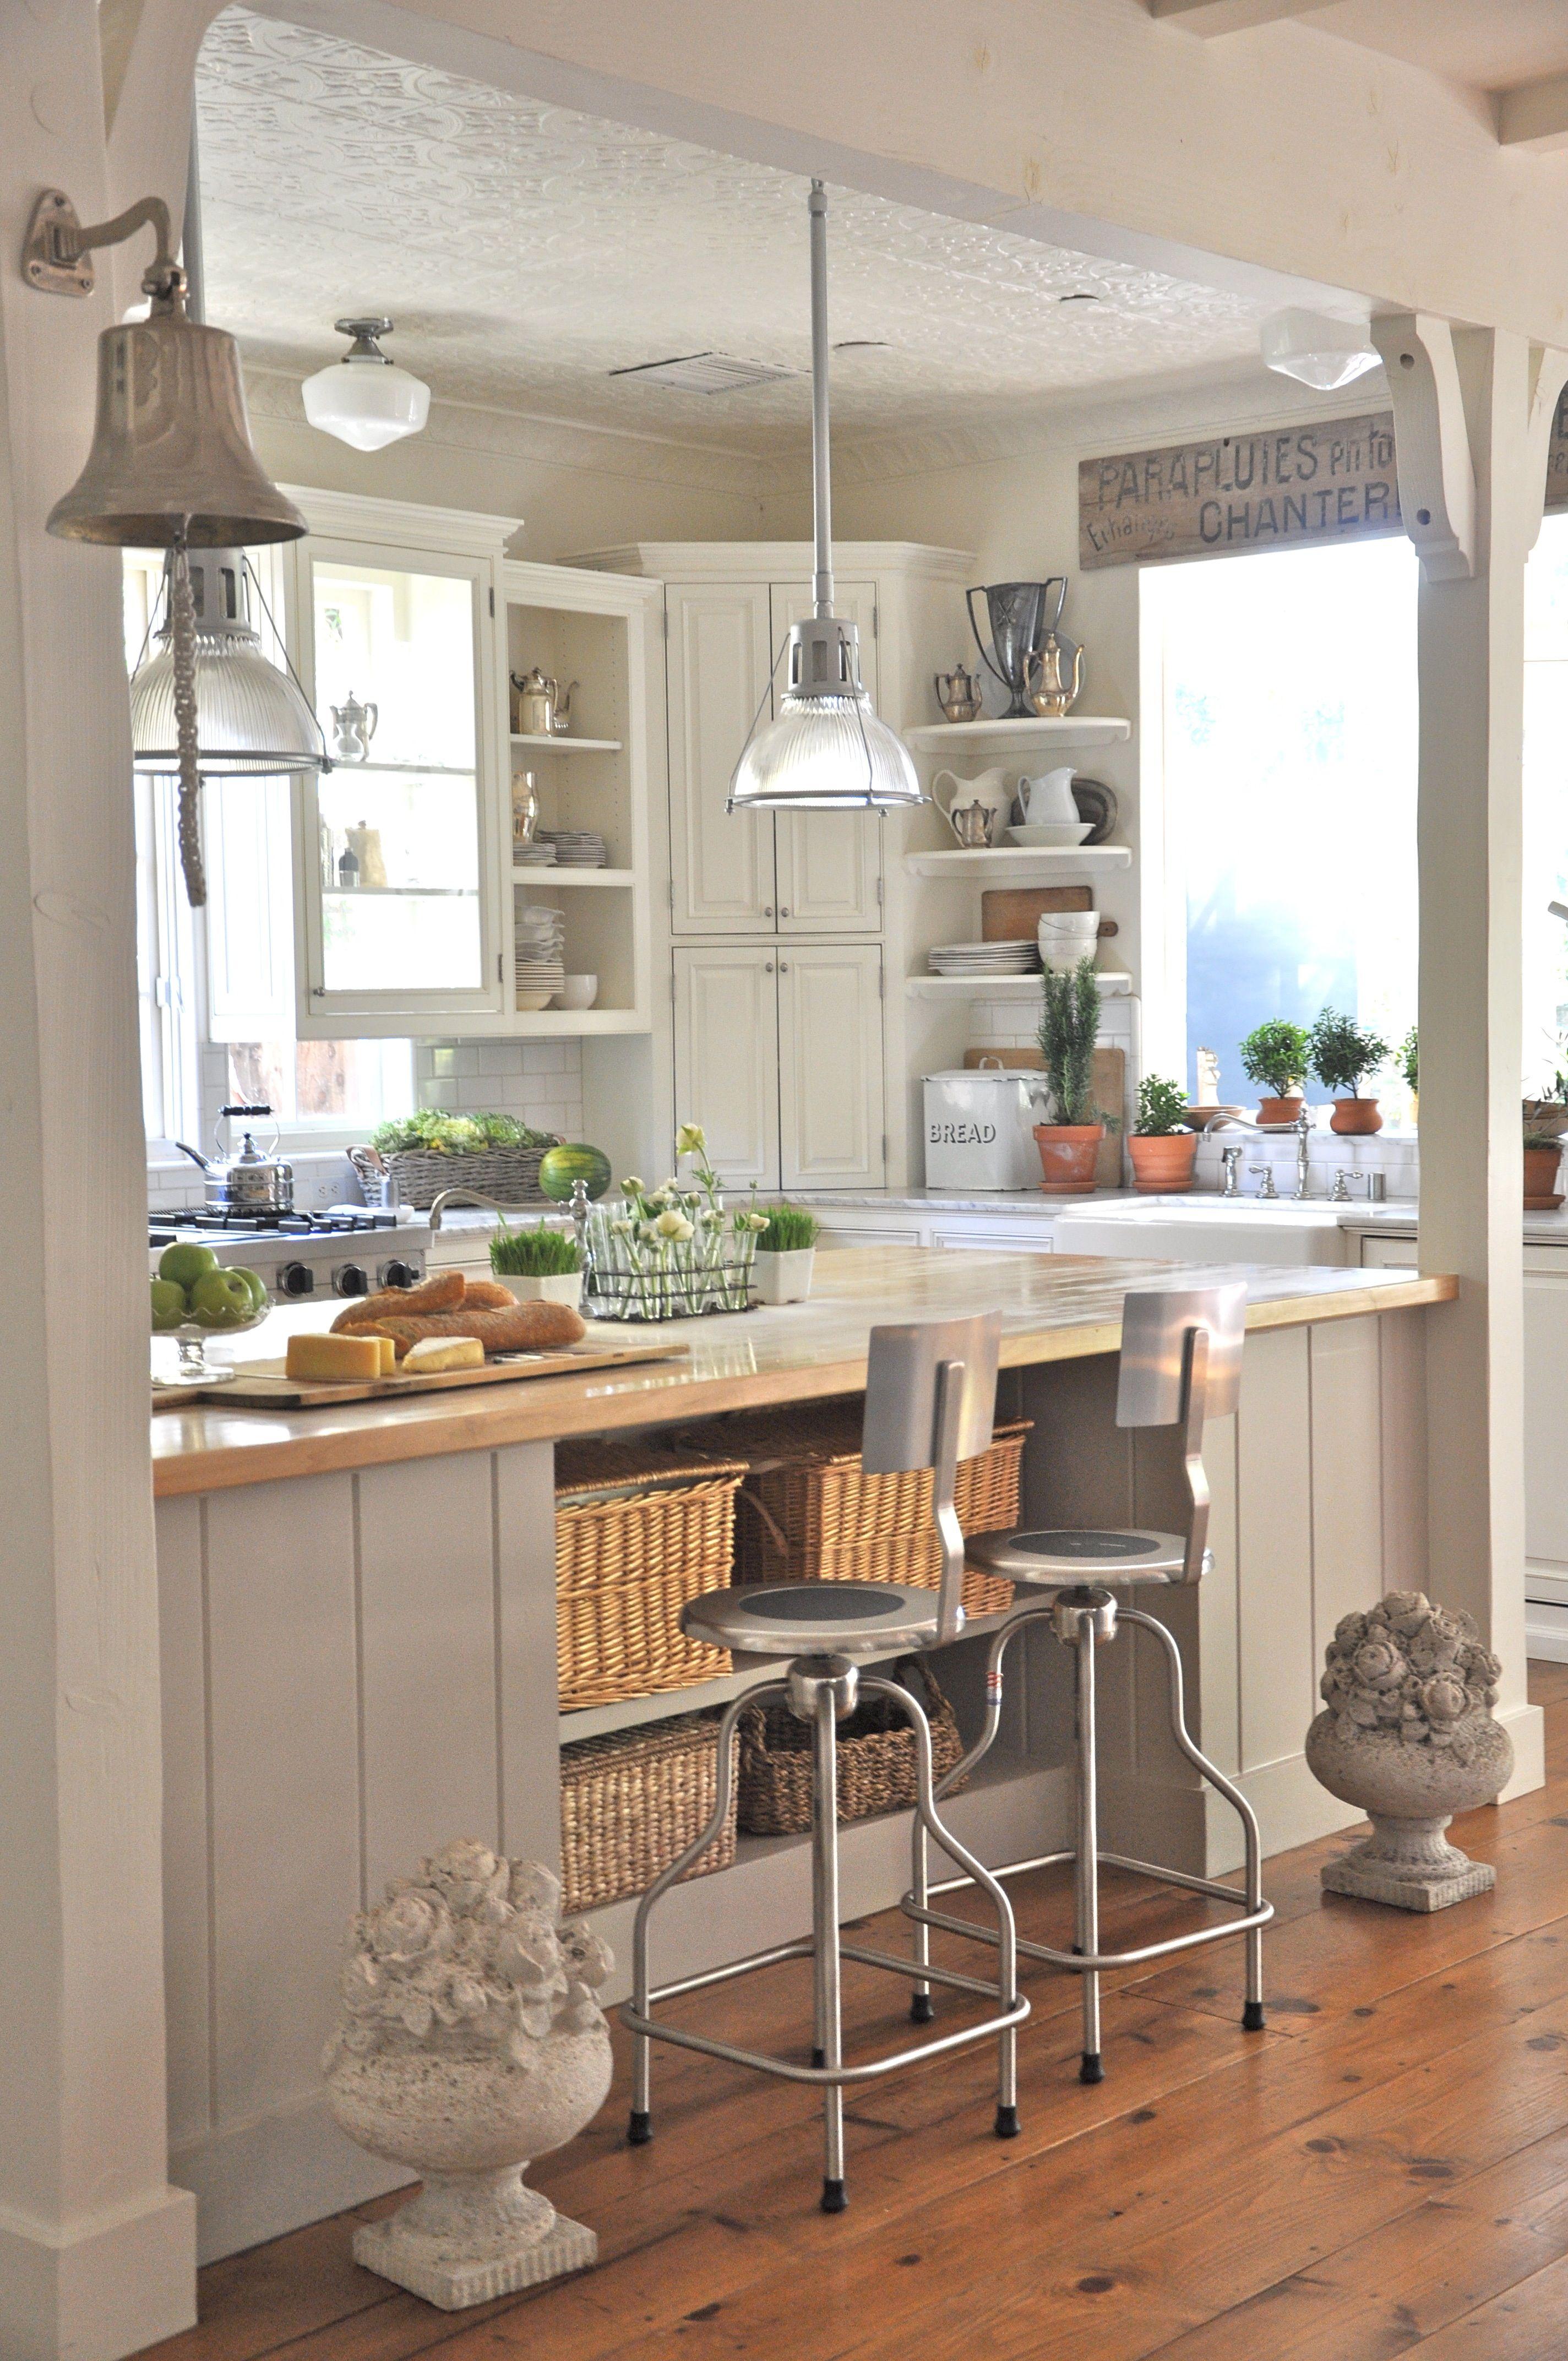 Hers Design With A Feminine Touch Shabby Chic Kitchen Decor Cottage Kitchens Kitchen Decor